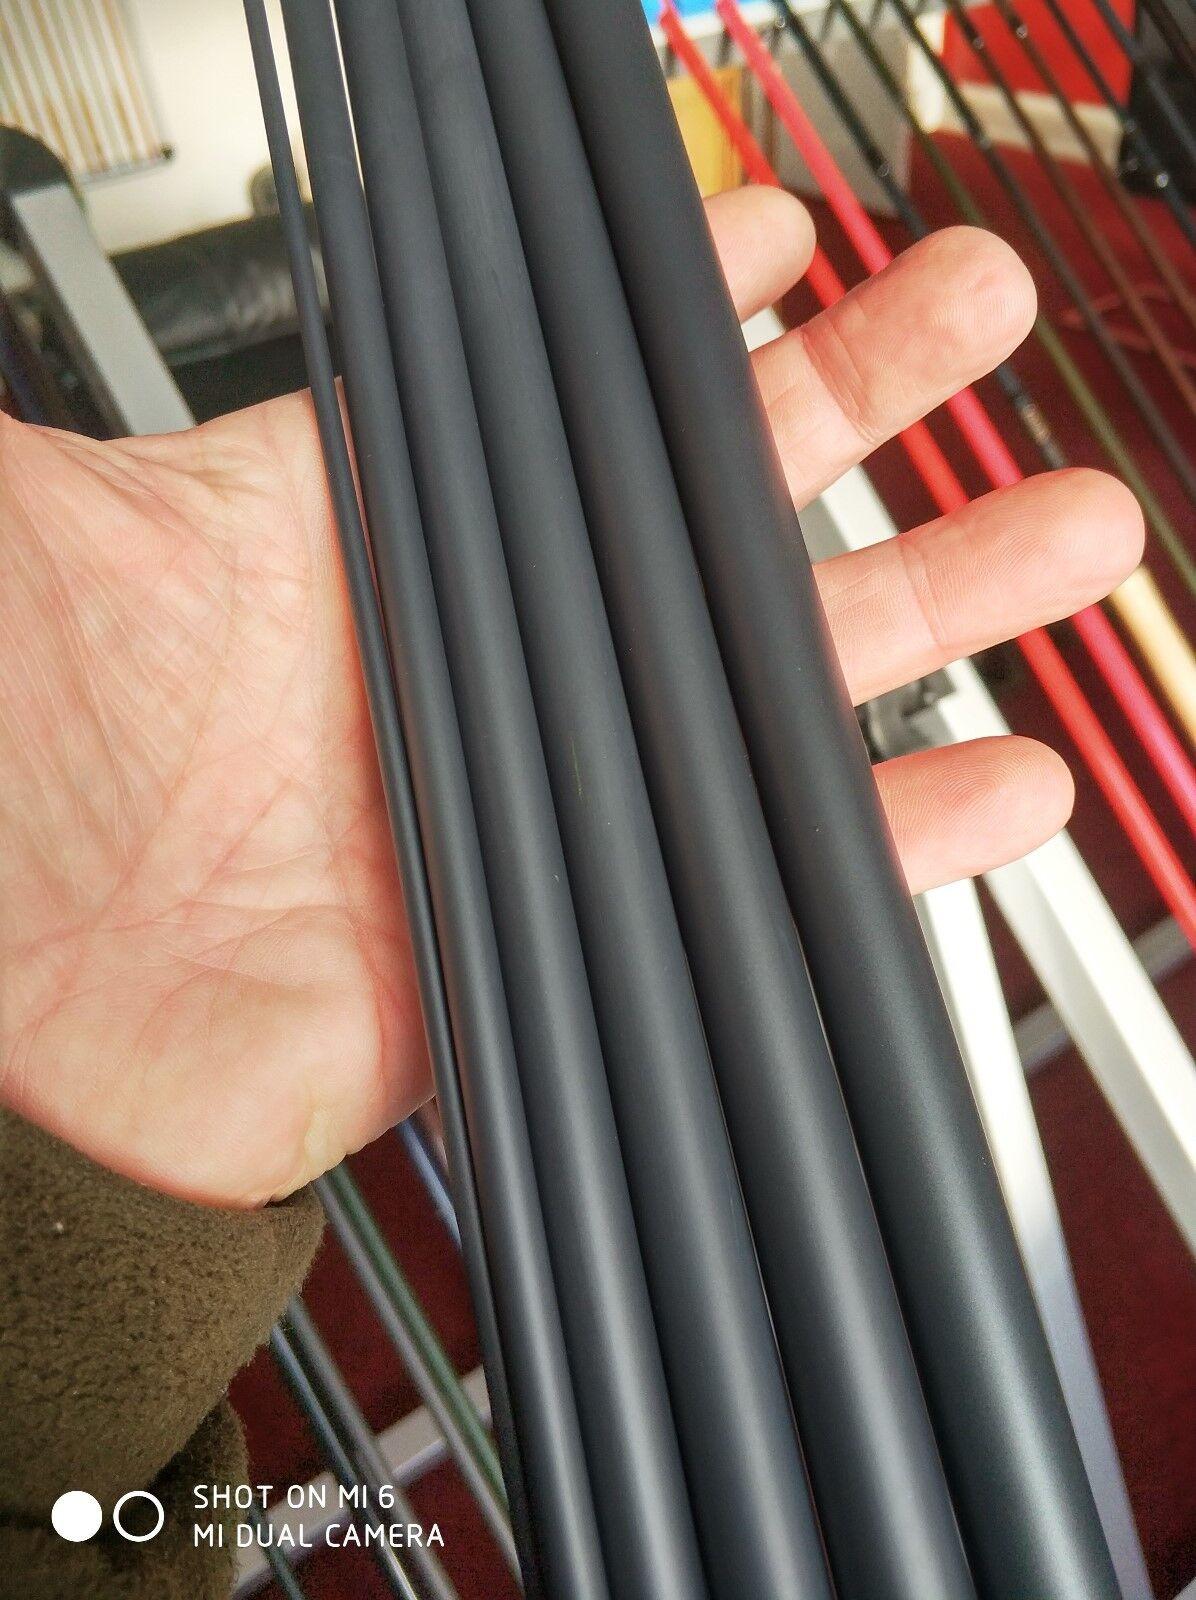 Bloke fly rod blank XLeNT 14' 6  10 11wt 6-piece  HALF PRICE LAUNCH OFFER